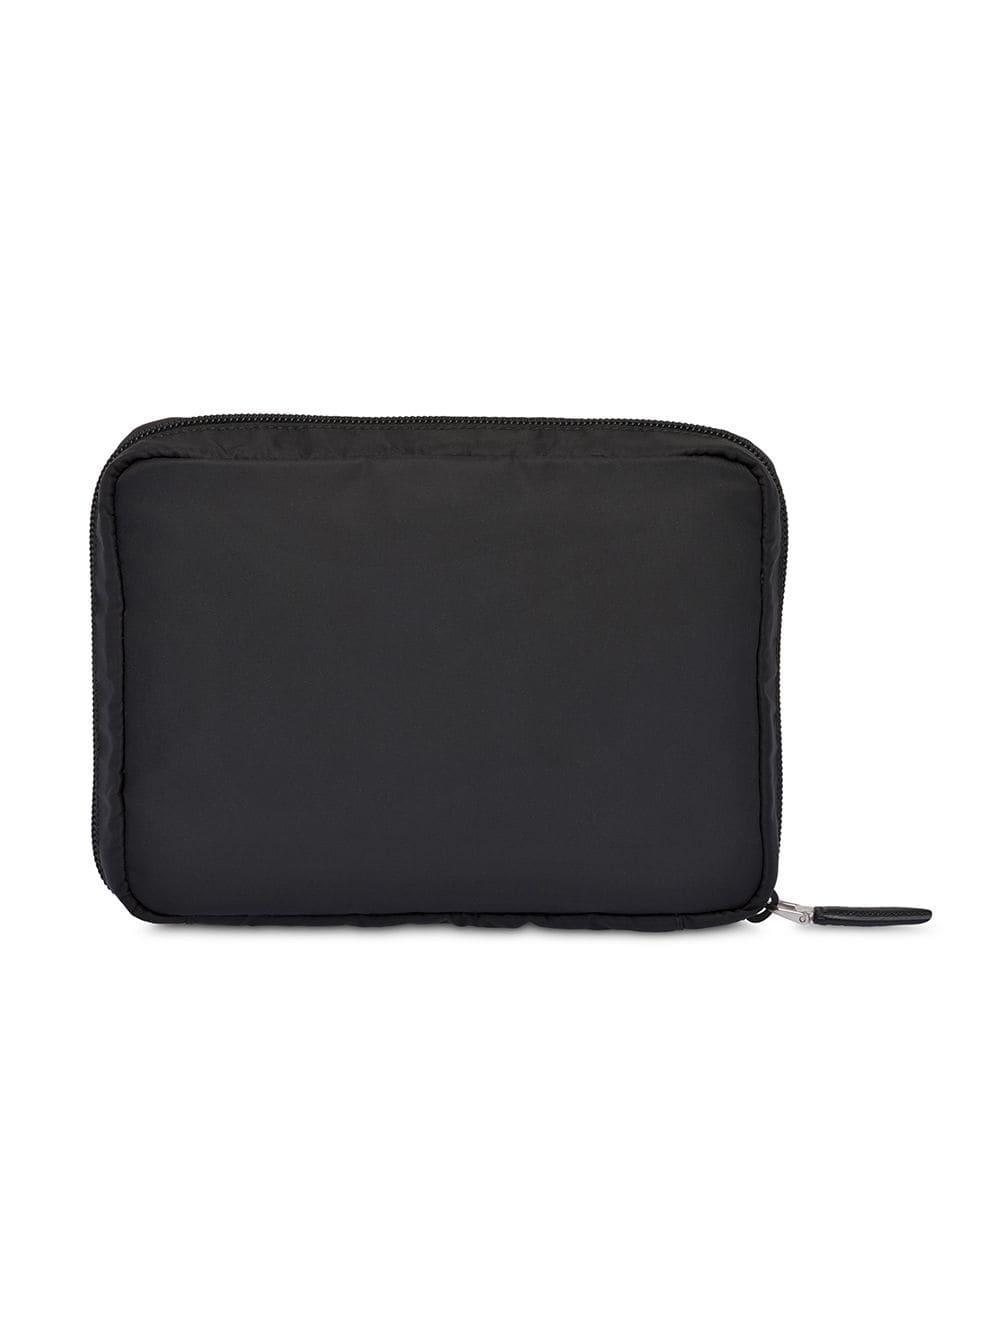 Prada Logo Plaque Travel Pouch in Black for Men - Lyst e5fea3a29ff64